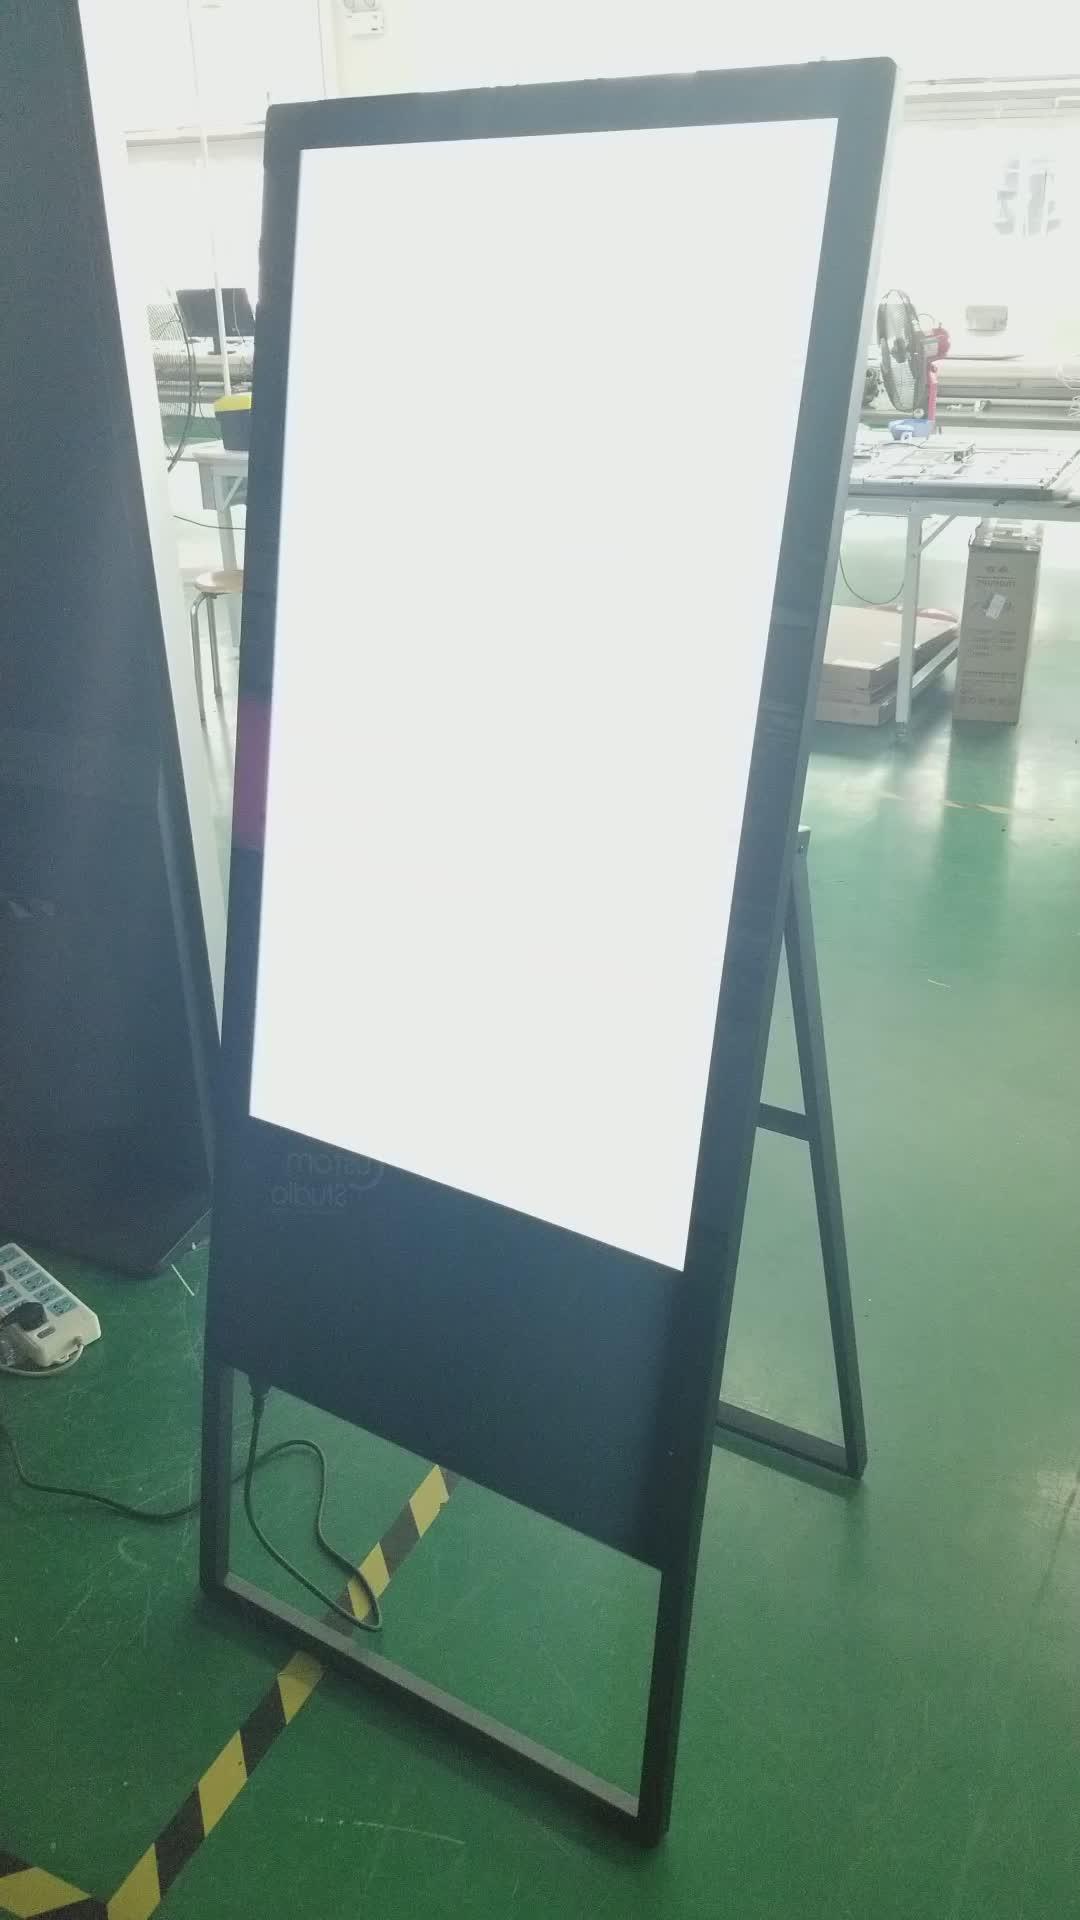 Newest Ultra thin 43 inch vertical portable digital signage kiosk